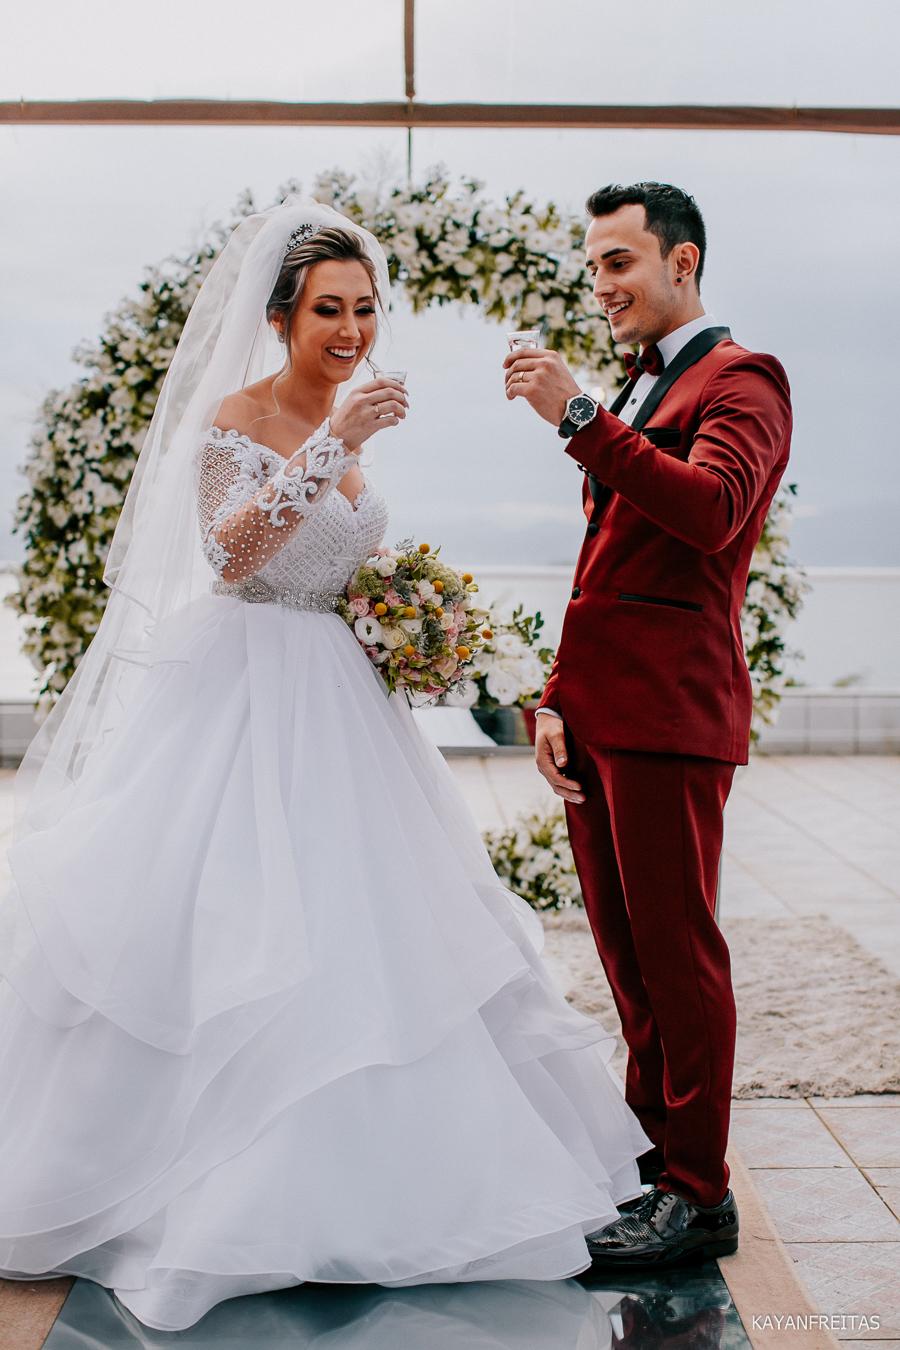 casamento-mariadomar-floripa-0101 Casamento Jéssica e Felipe - Maria do Mar Hotel